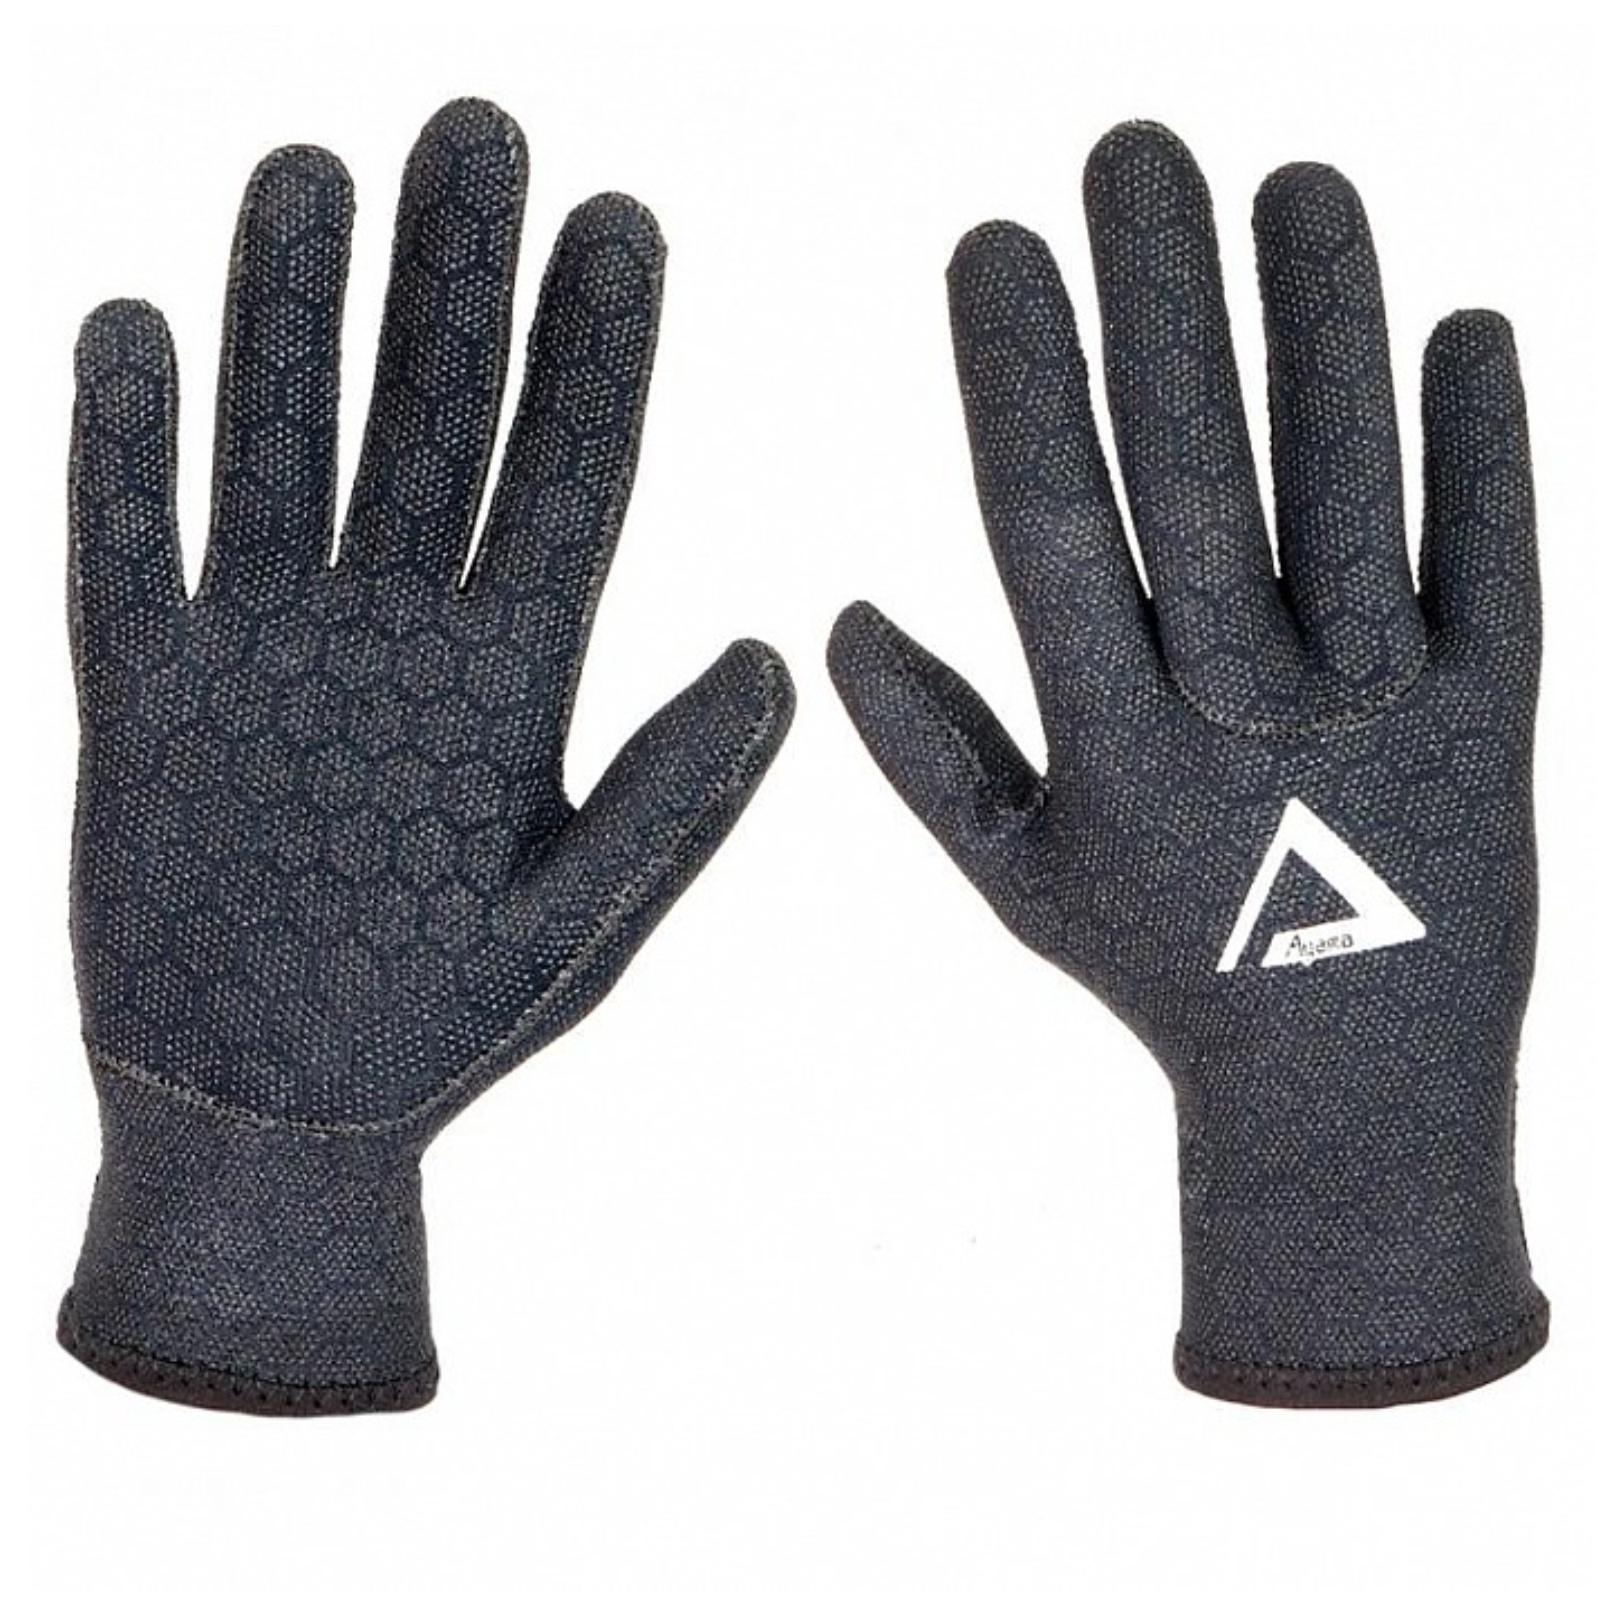 Neoprenové rukavice AGAMA Superstretch 3 mm - vel. XL